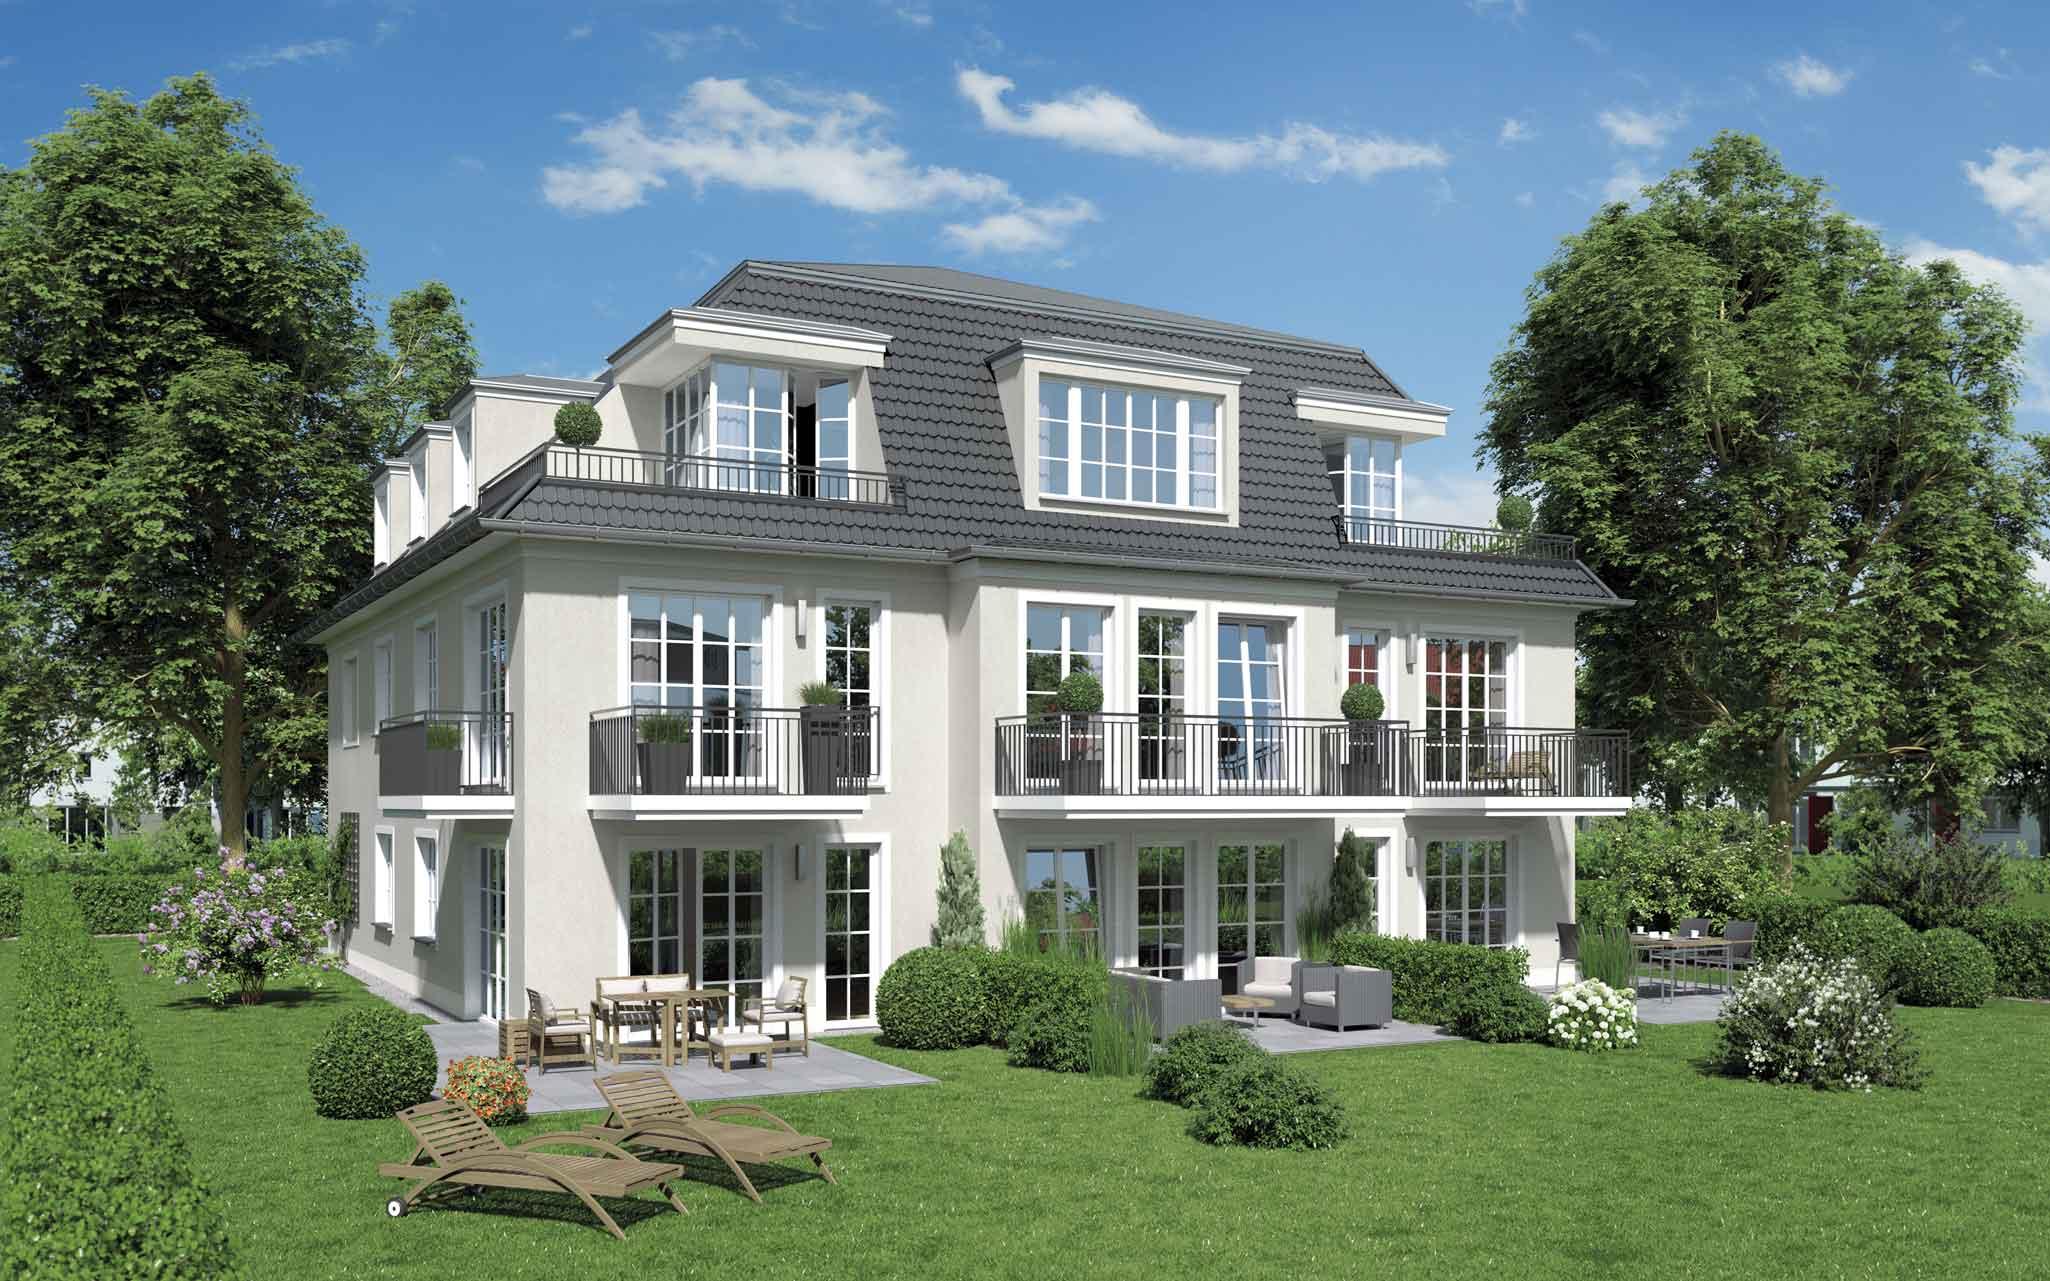 eckart immobilien bautr ger grundbesitz ihr bautr ger in m nchen. Black Bedroom Furniture Sets. Home Design Ideas